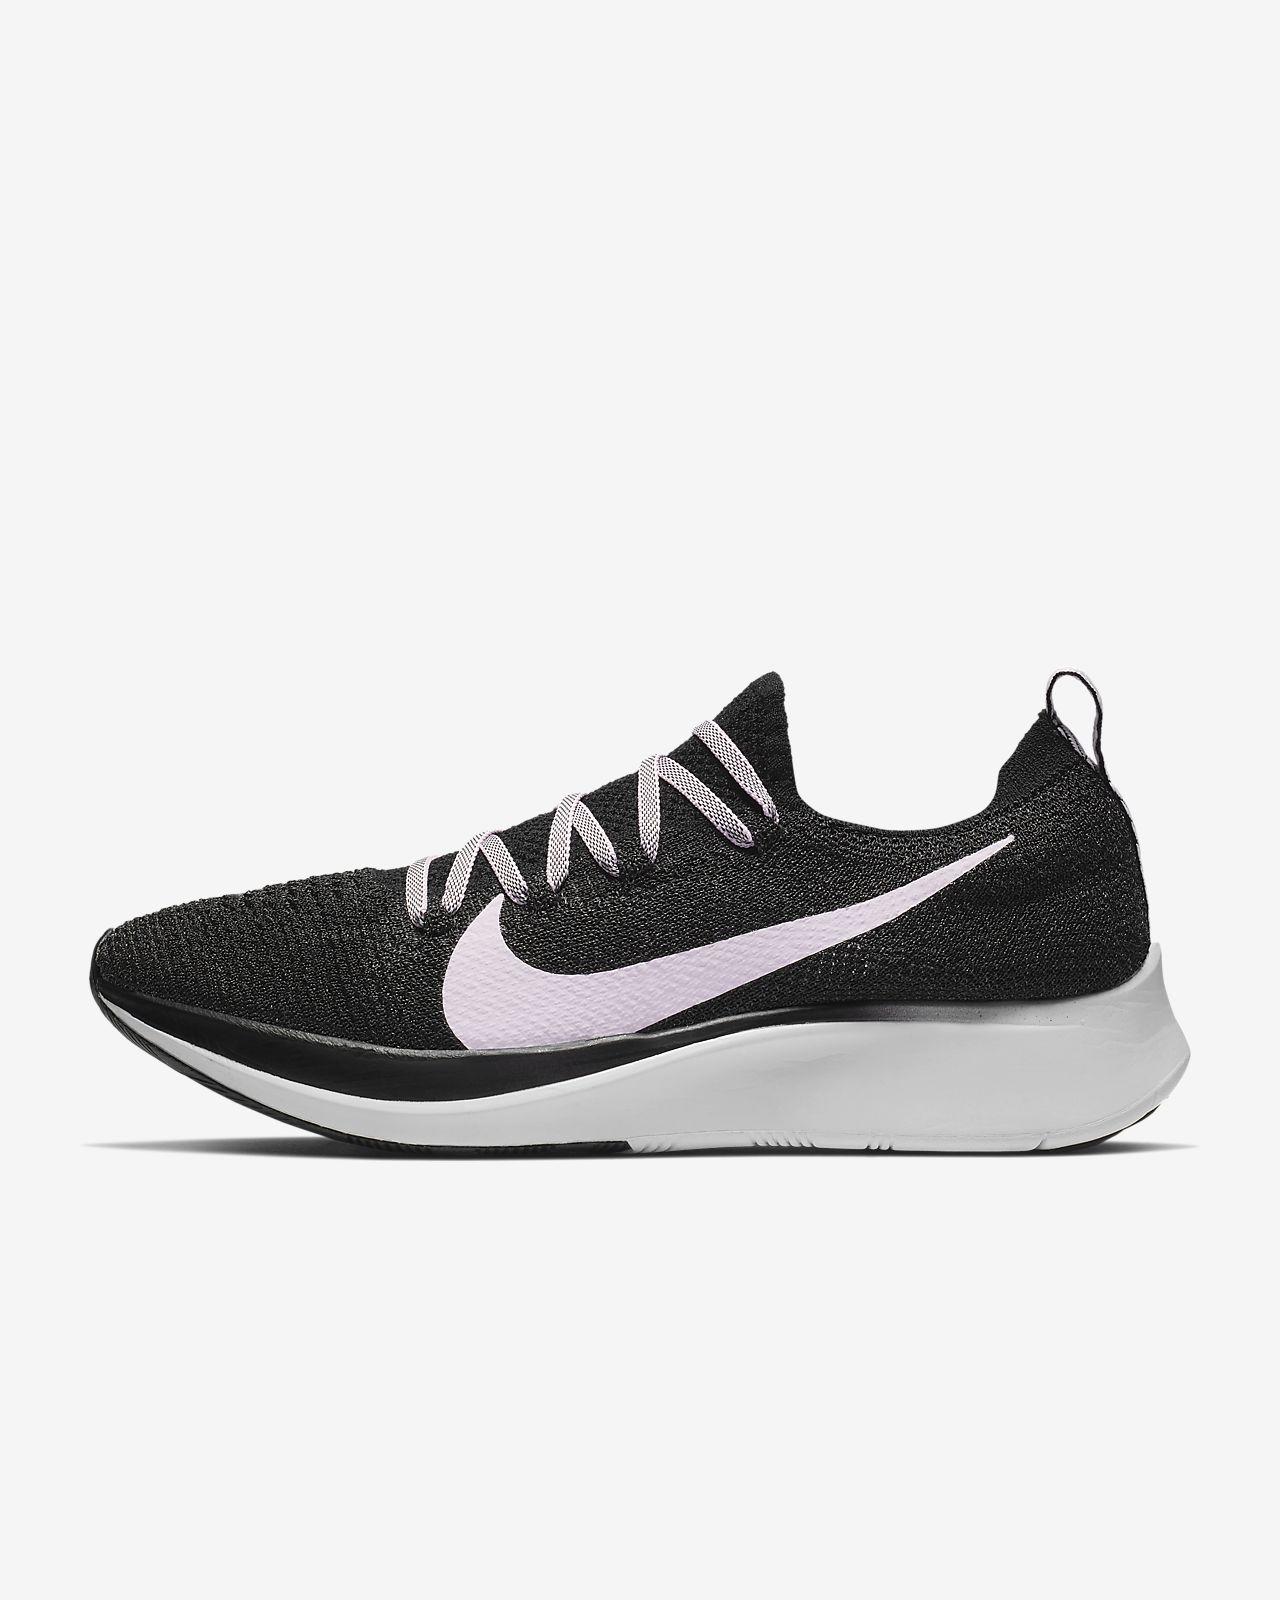 Calzado de running para mujer Nike Zoom Fly Flyknit